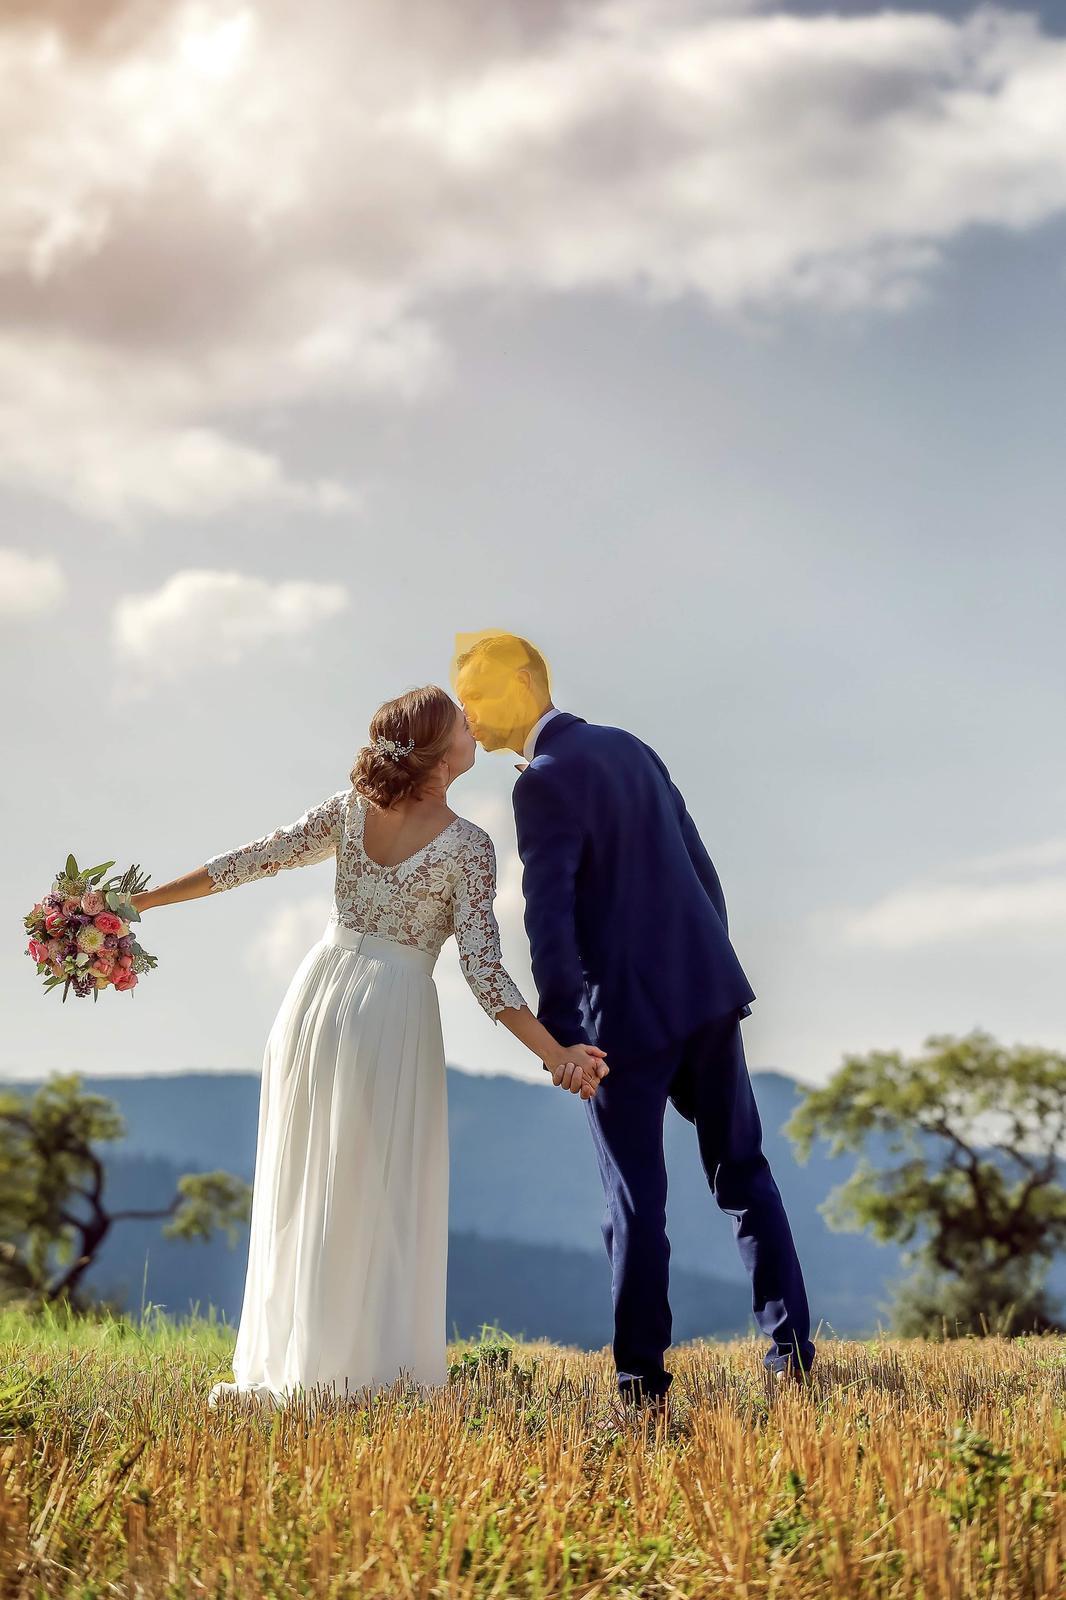 Jednoduché svadobné šaty - Obrázok č. 2